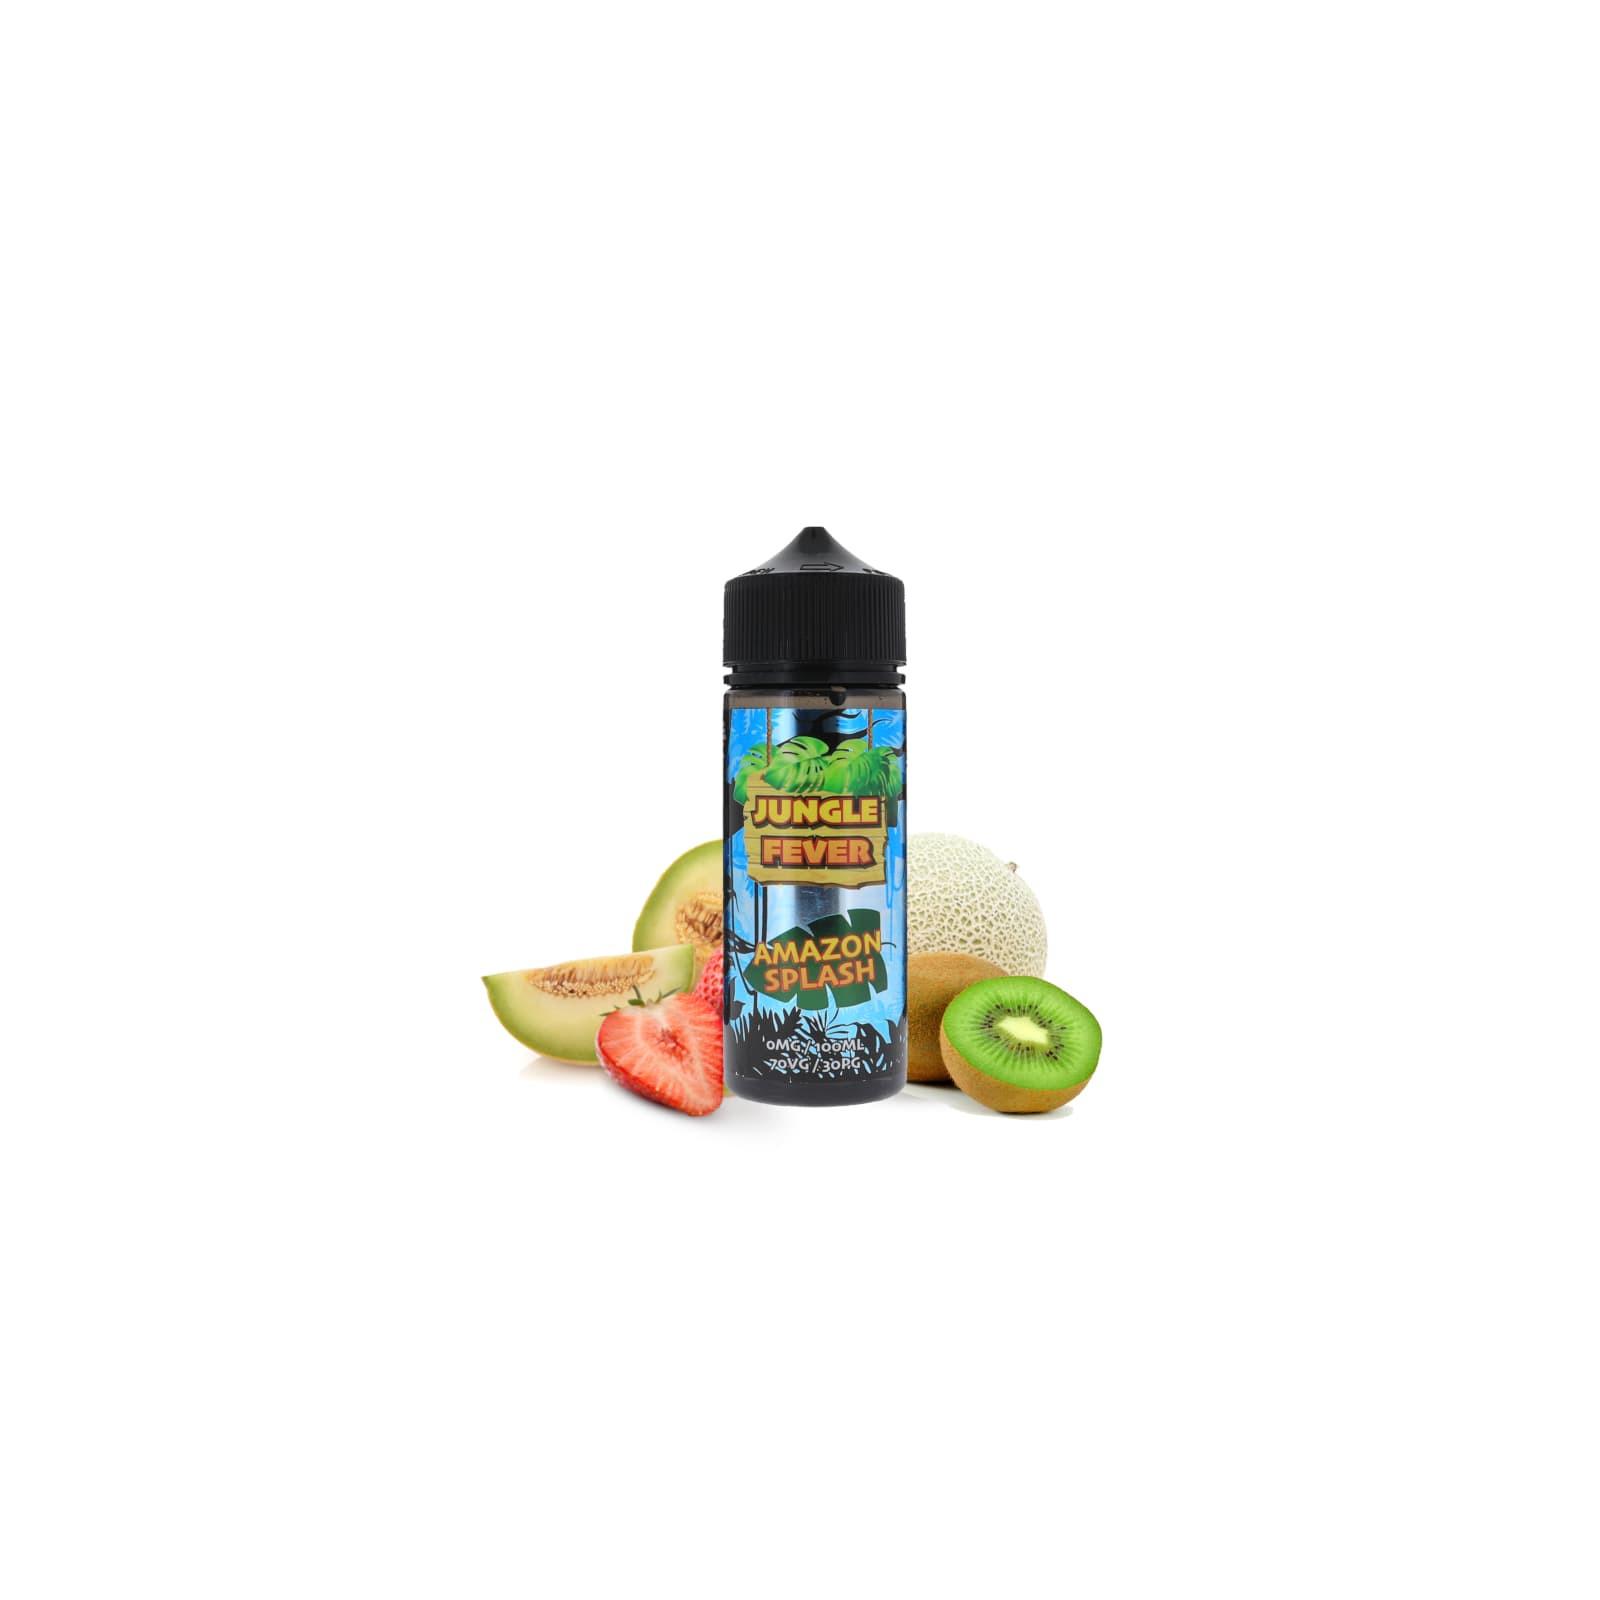 Amazon Splash 100ml - Jungle Fever